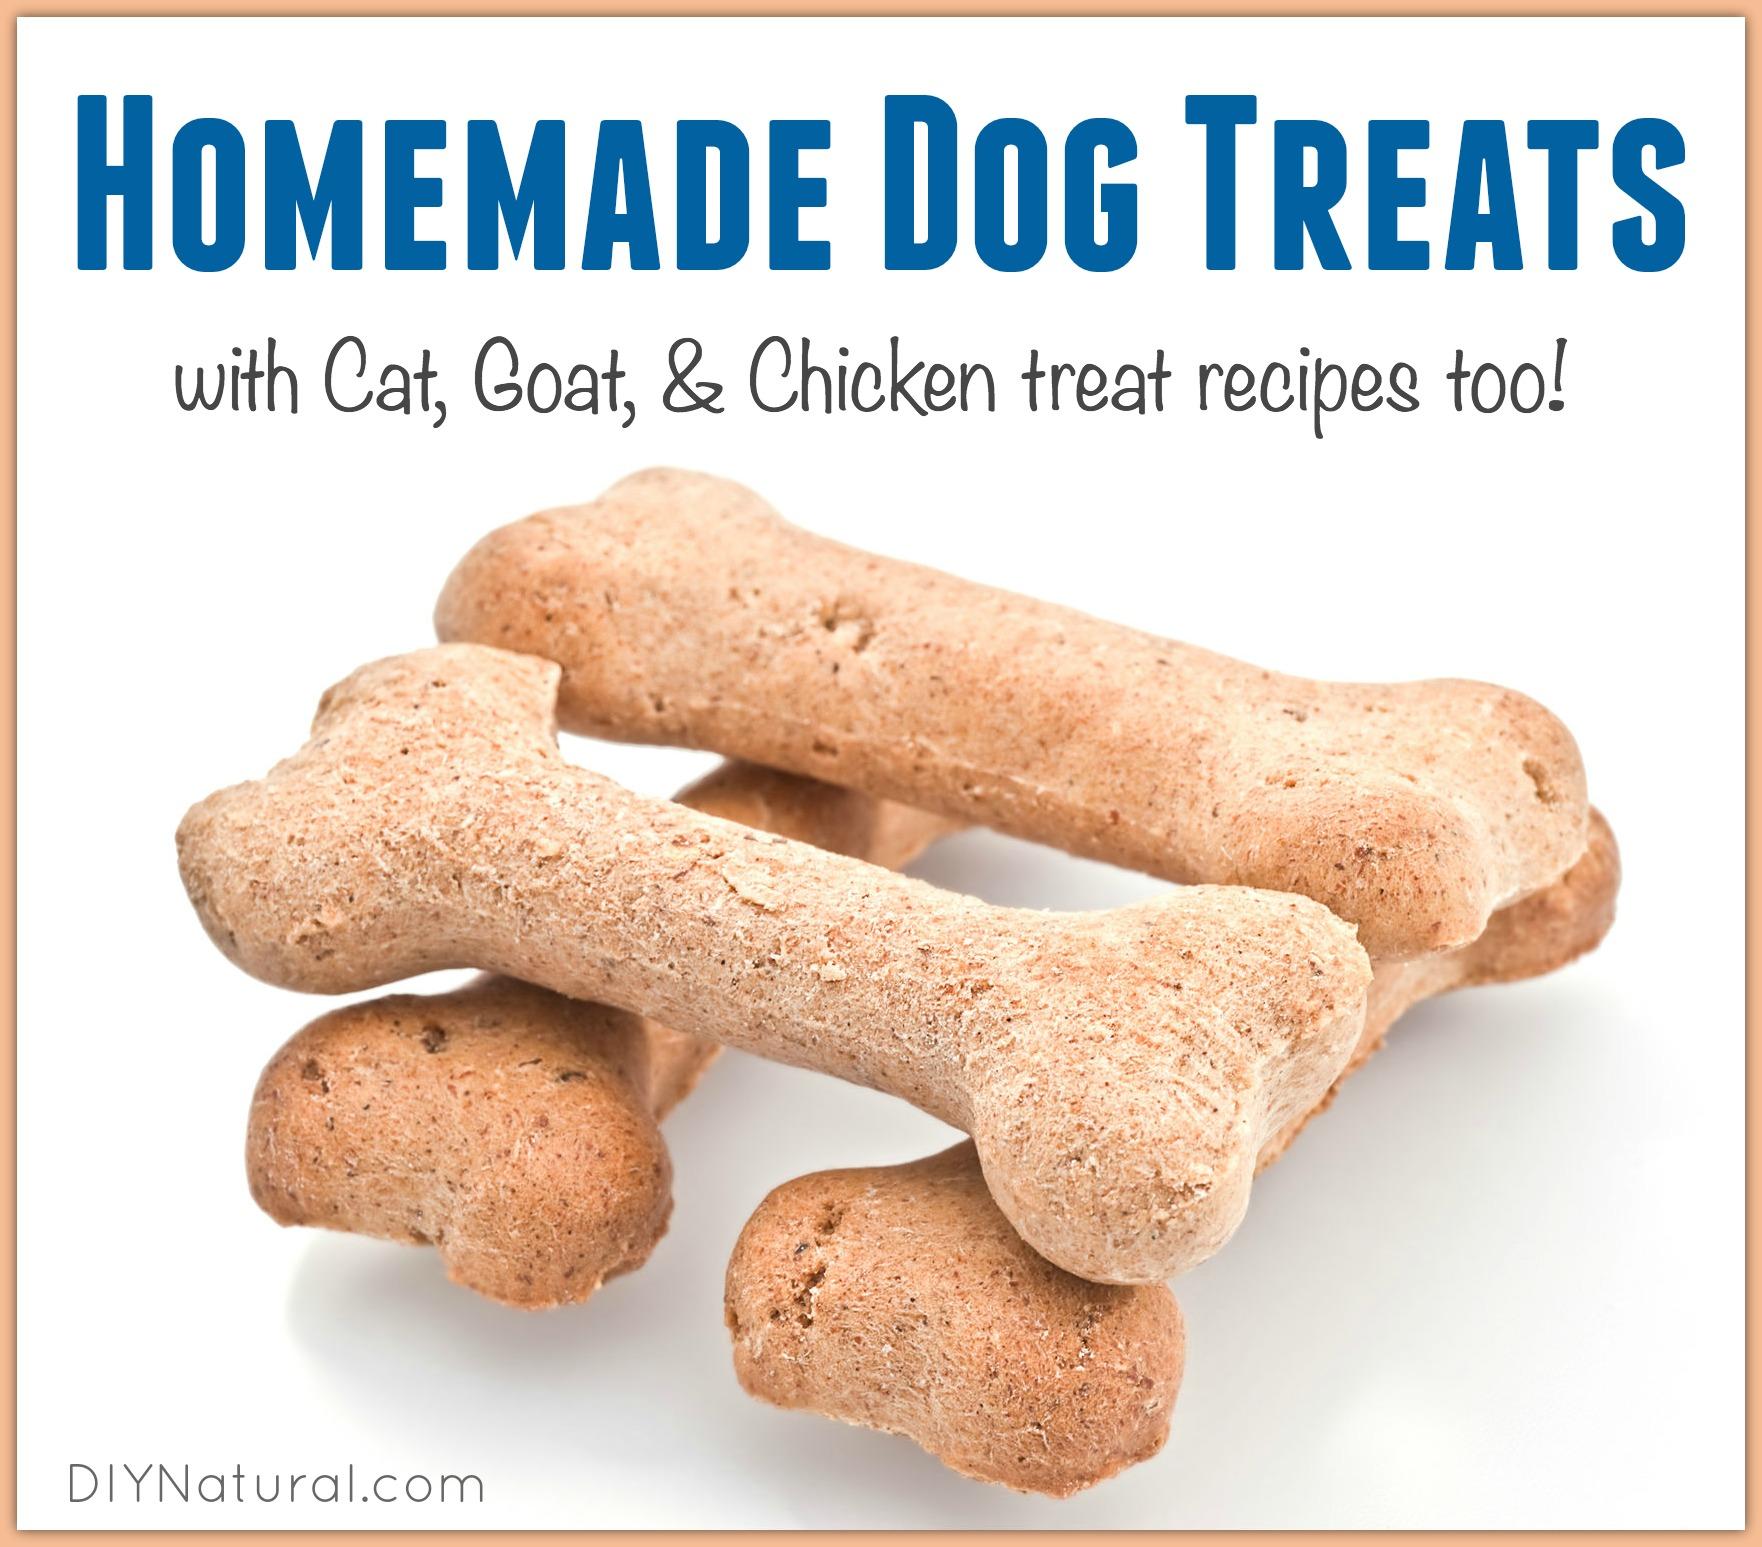 All Natural Dog Treat Recipes